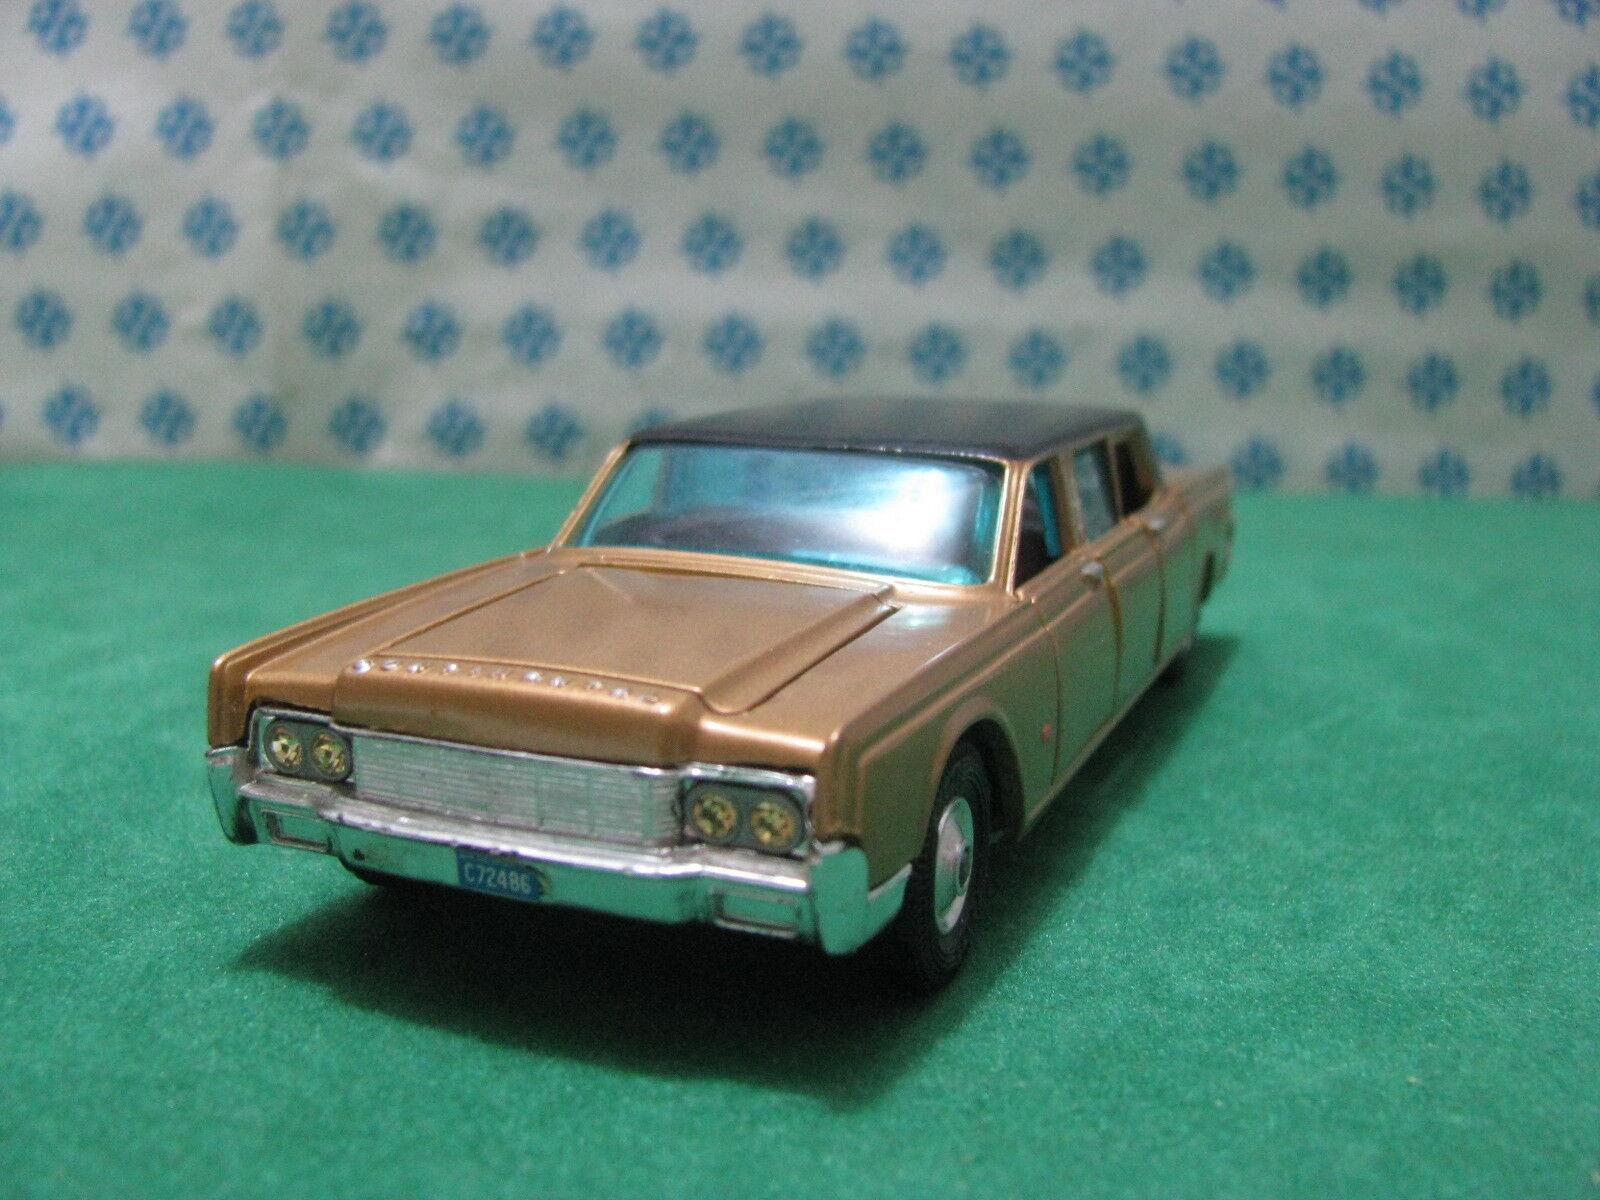 Vintage  -   LINCOLN CONTINENTAL    - 1 43  Corgi Toys  262  Nuova